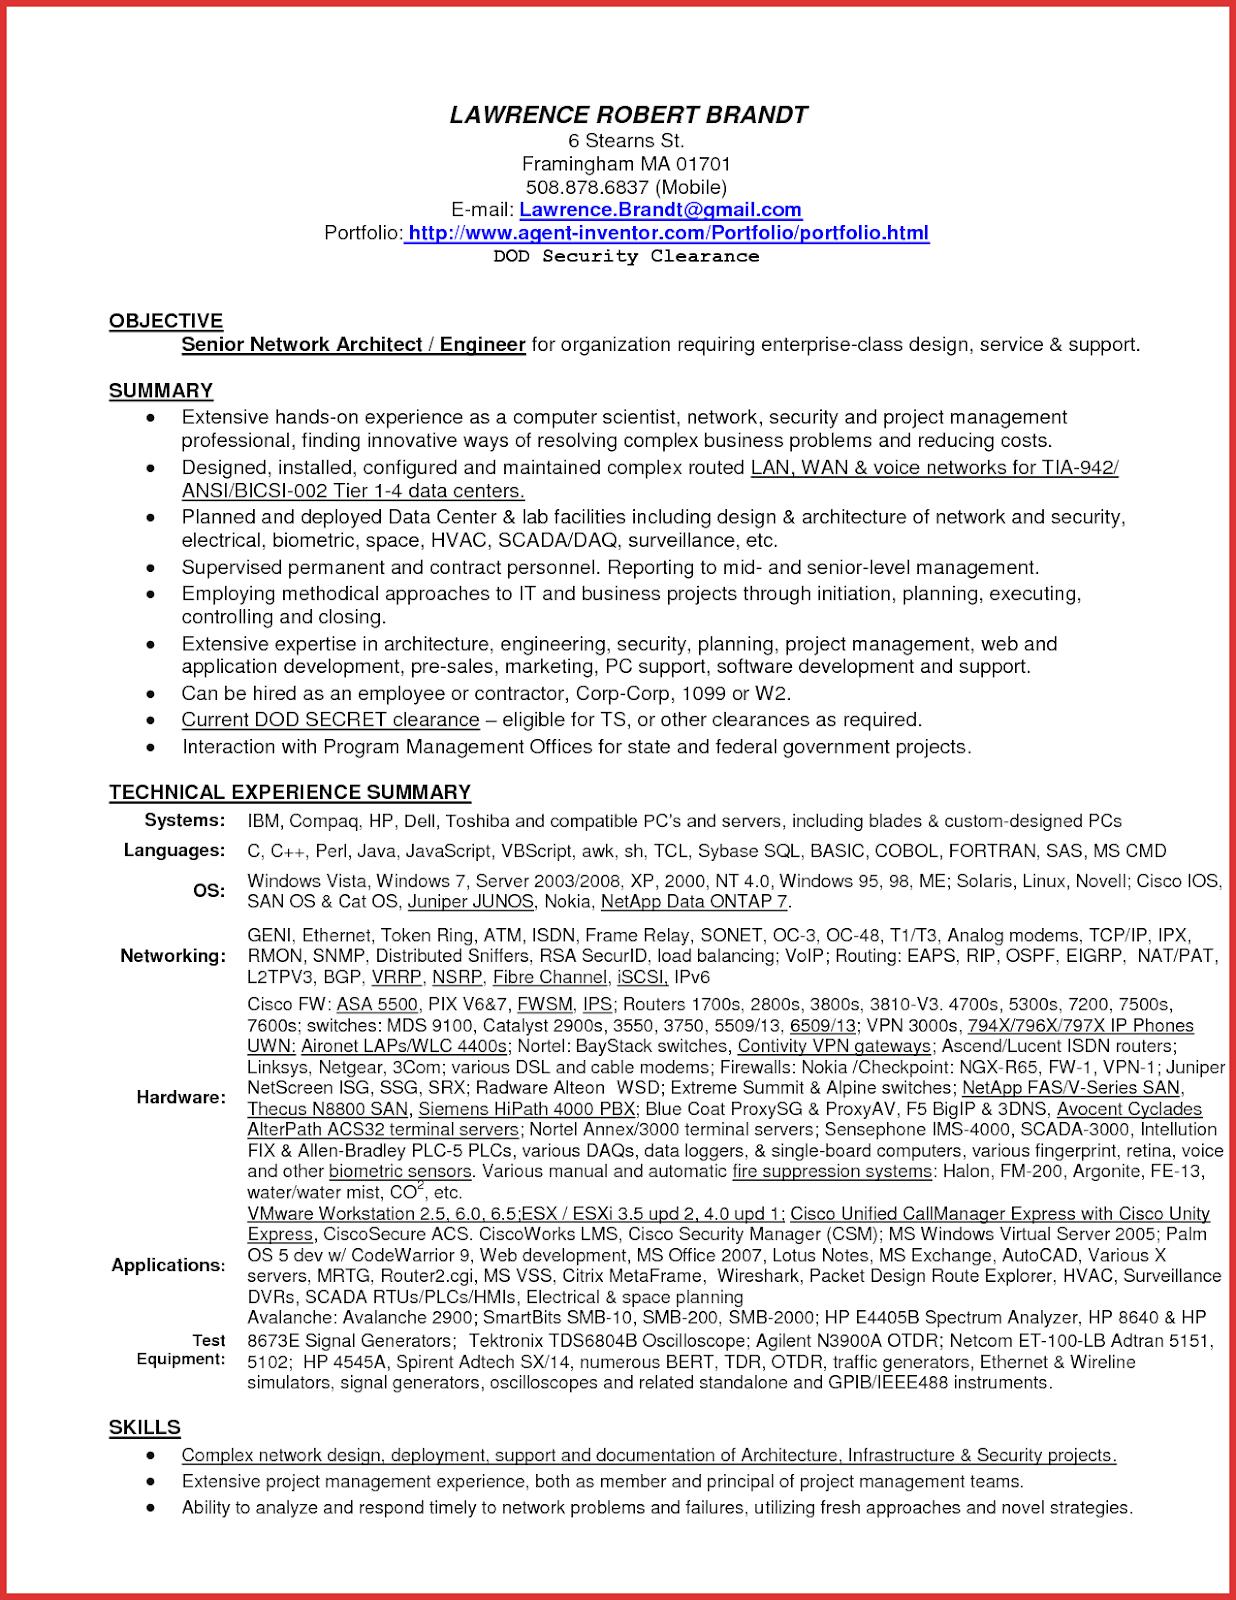 Network Architect Resume Pdf 2019 Network Architect Resume Objective 2020 Network Architect Resum Architect Resume Best Resume Template Architect Resume Sample